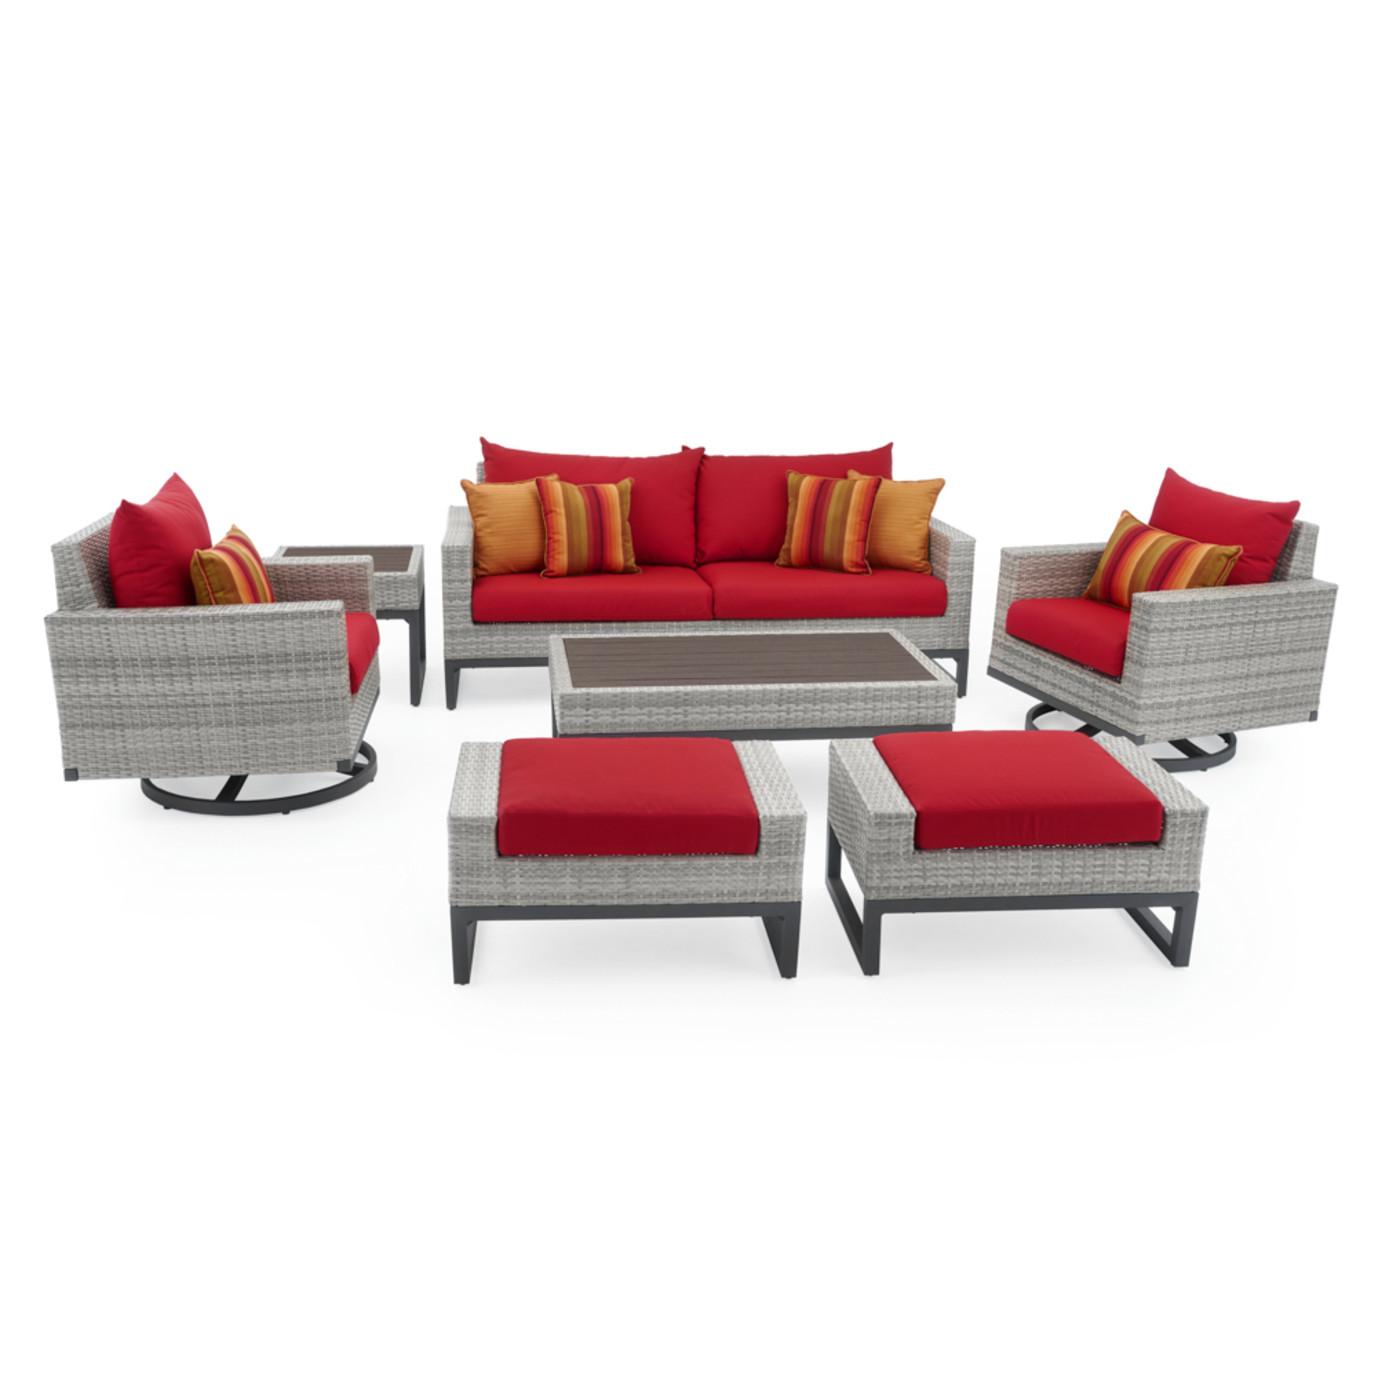 Milo™ Gray 7pc Motion Deep Seating Set - Sunset Red